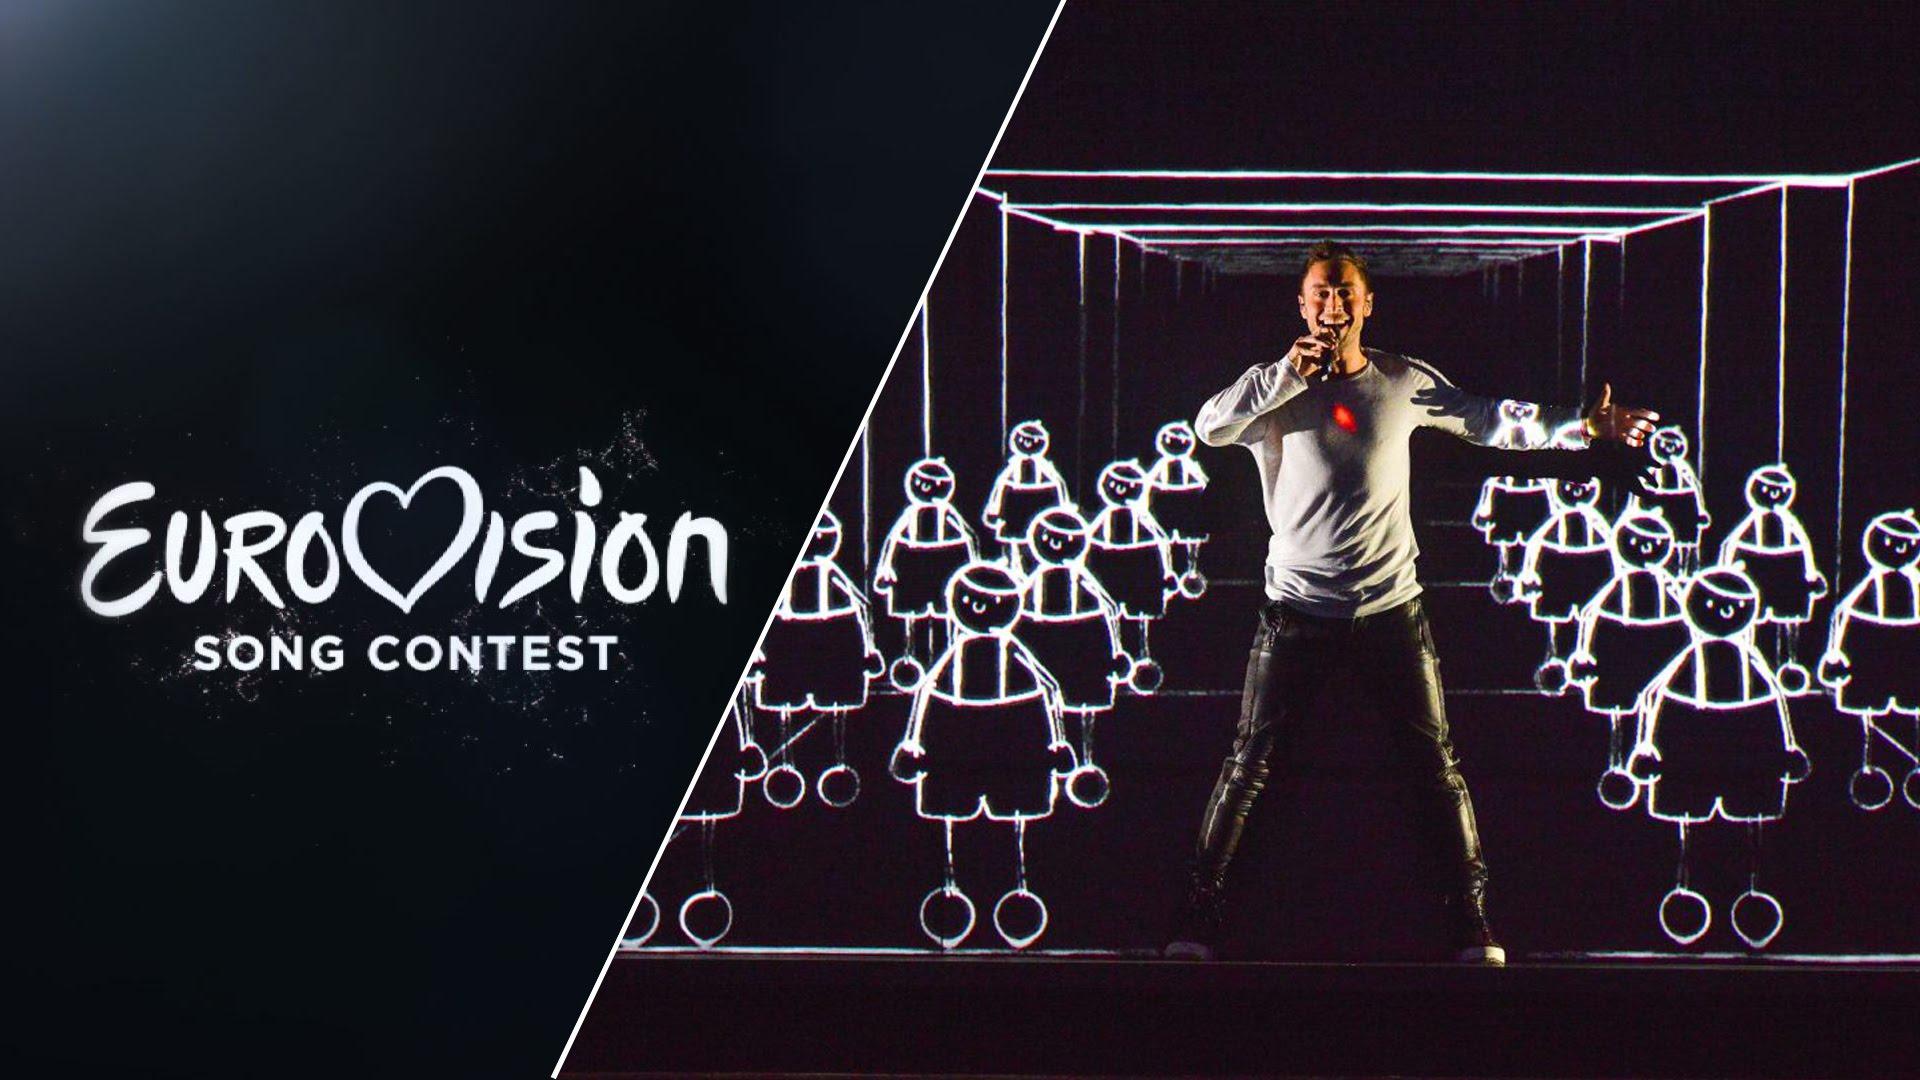 Måns Zelmerlöw - Heroes (Sweden) - LIVE at Eurovision 2015: Semi-Final 2